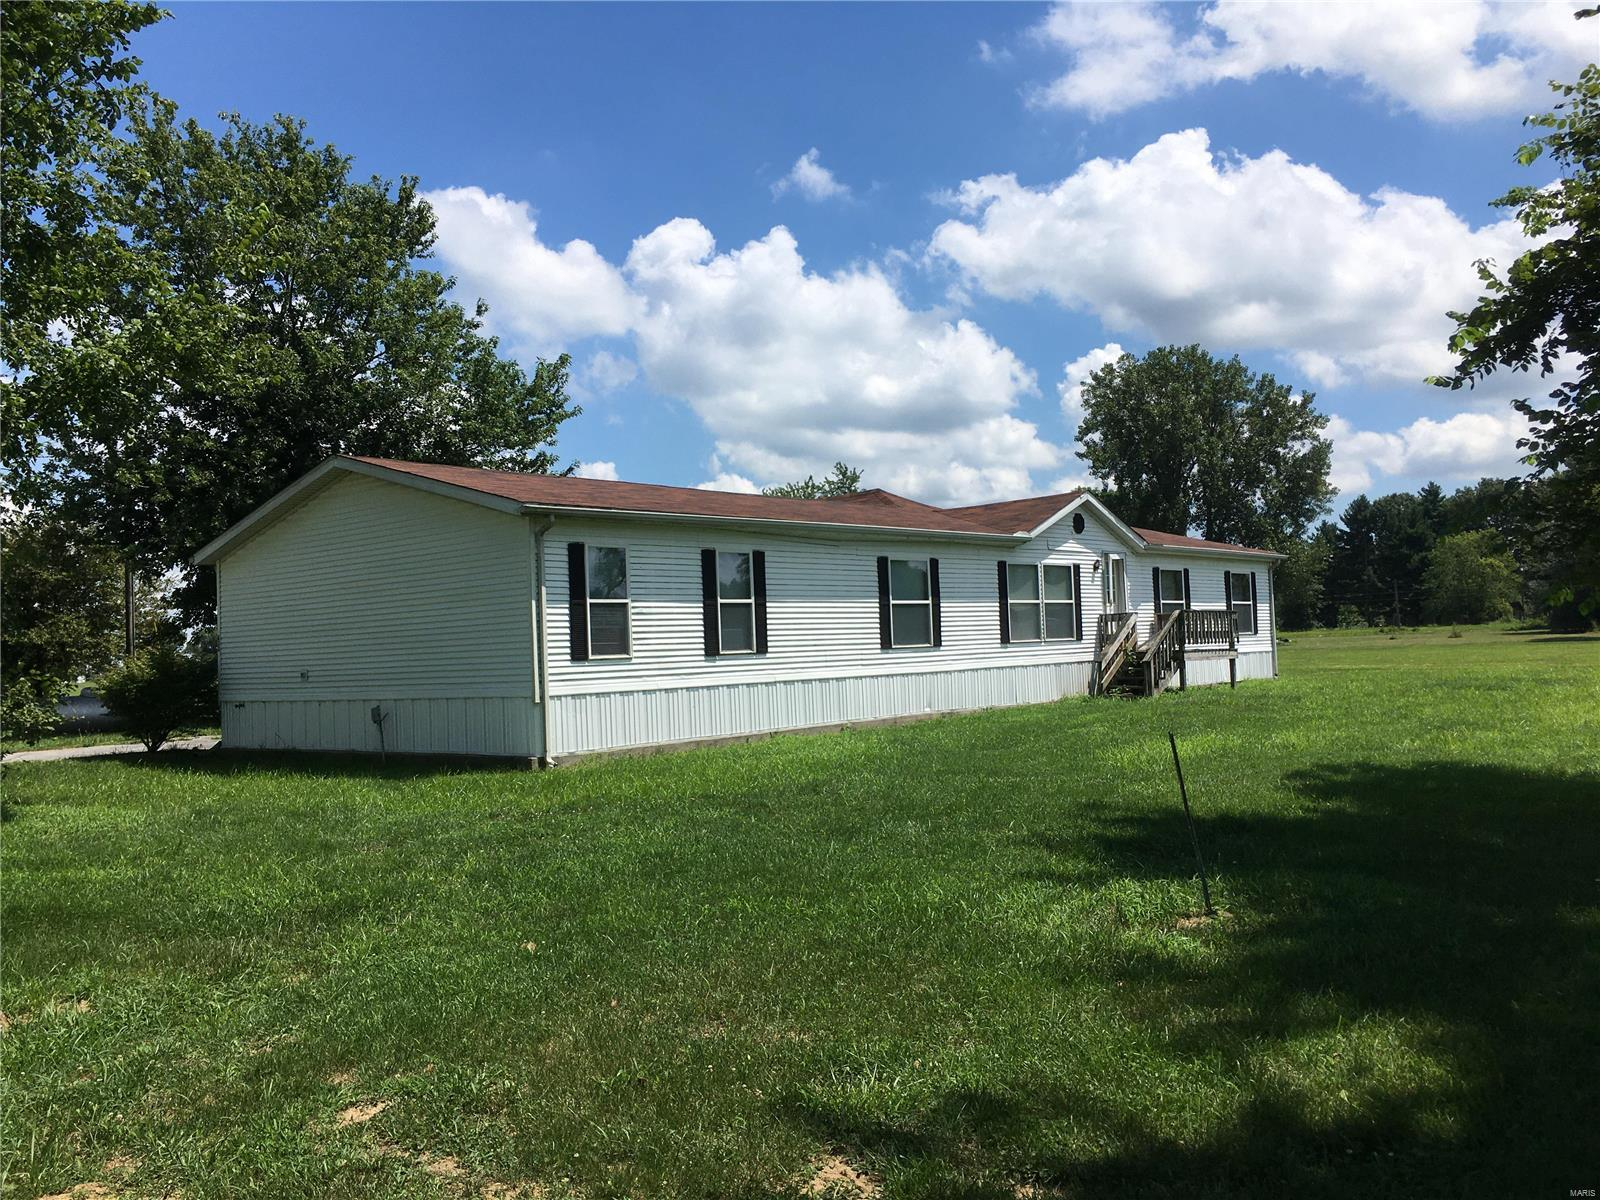 623 SEQUOIA Avenue Property Photo - Royal Lakes, IL real estate listing